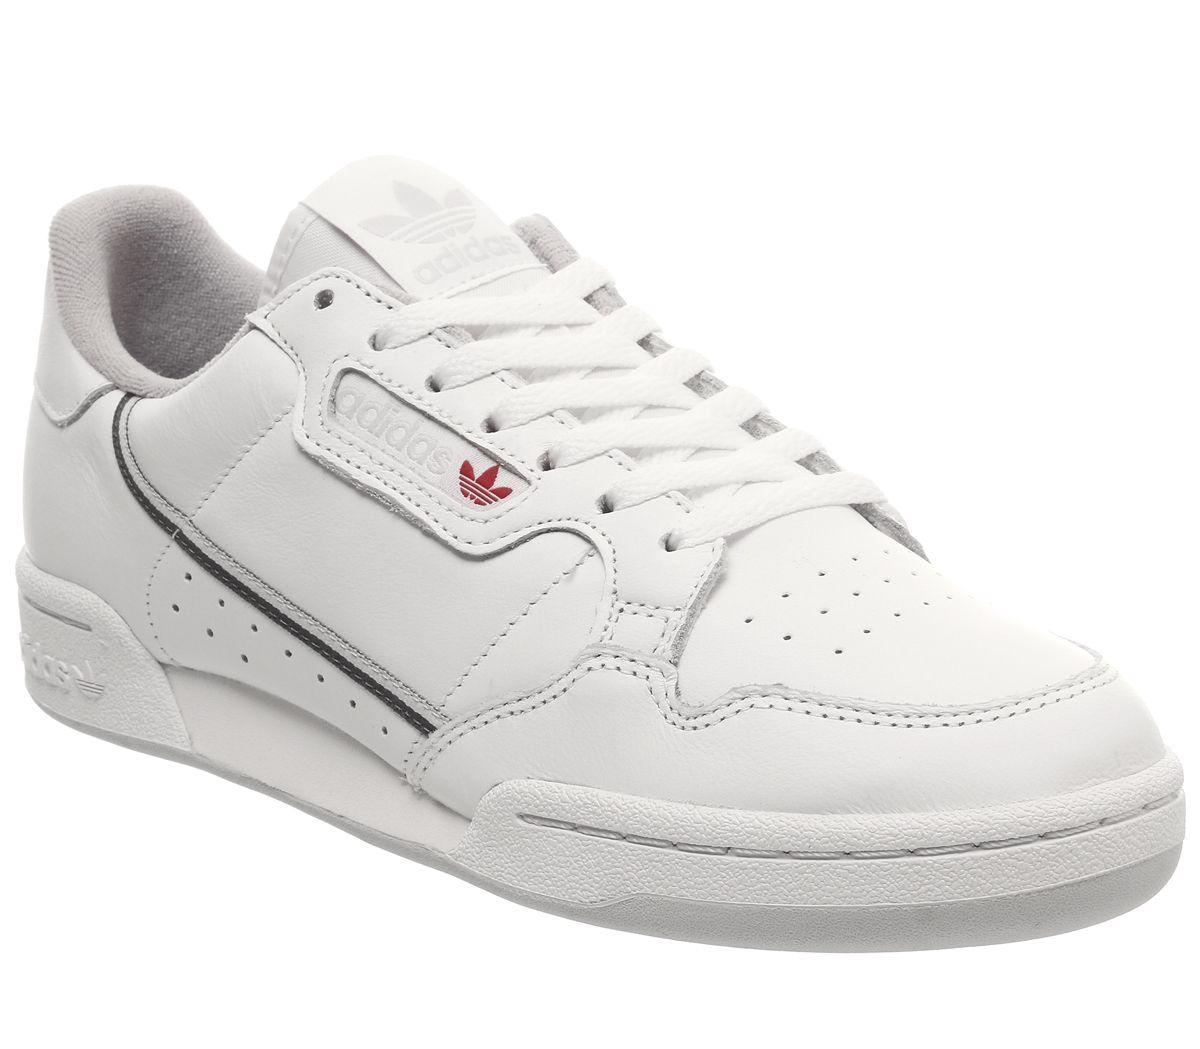 Adidas Continental 80 S baskets gris